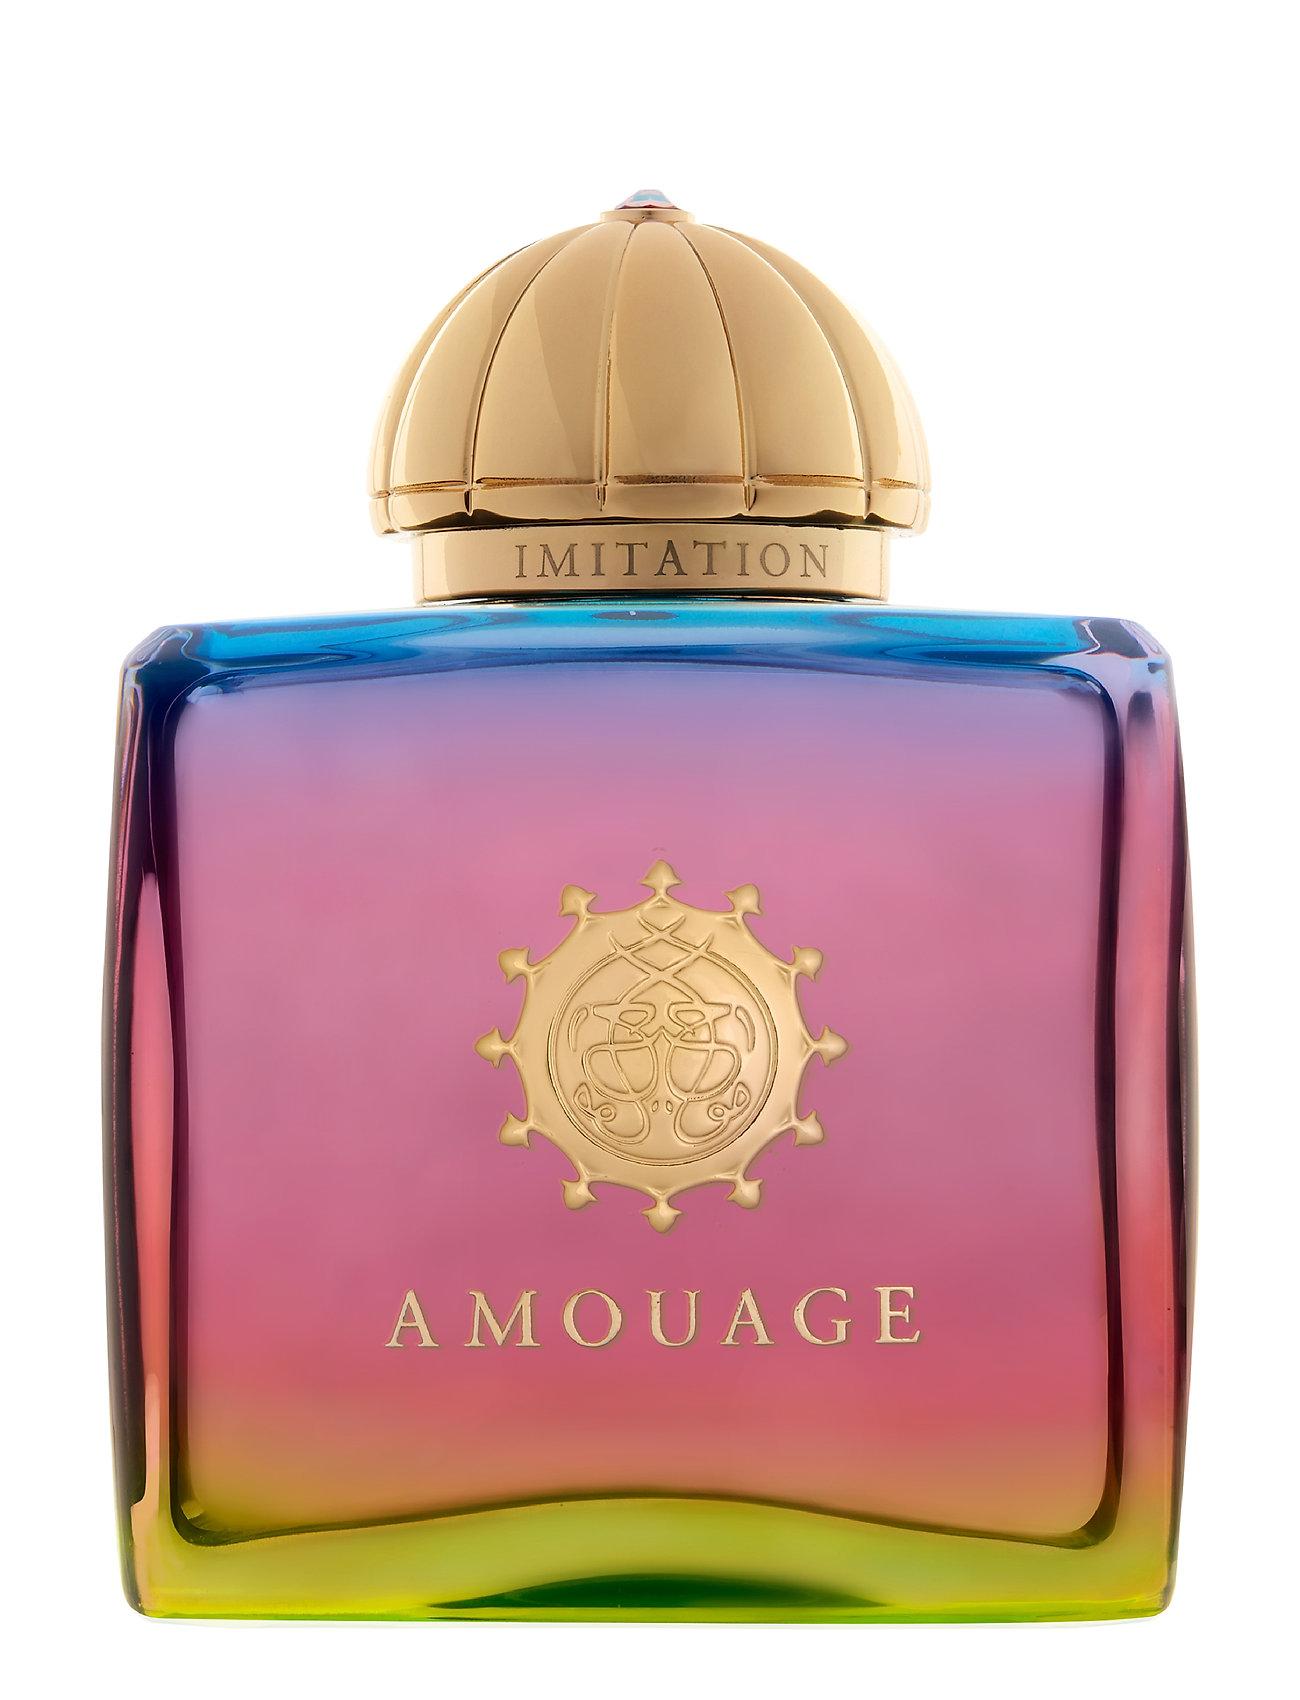 Amouage IMITATION WOMAN - CLEAR